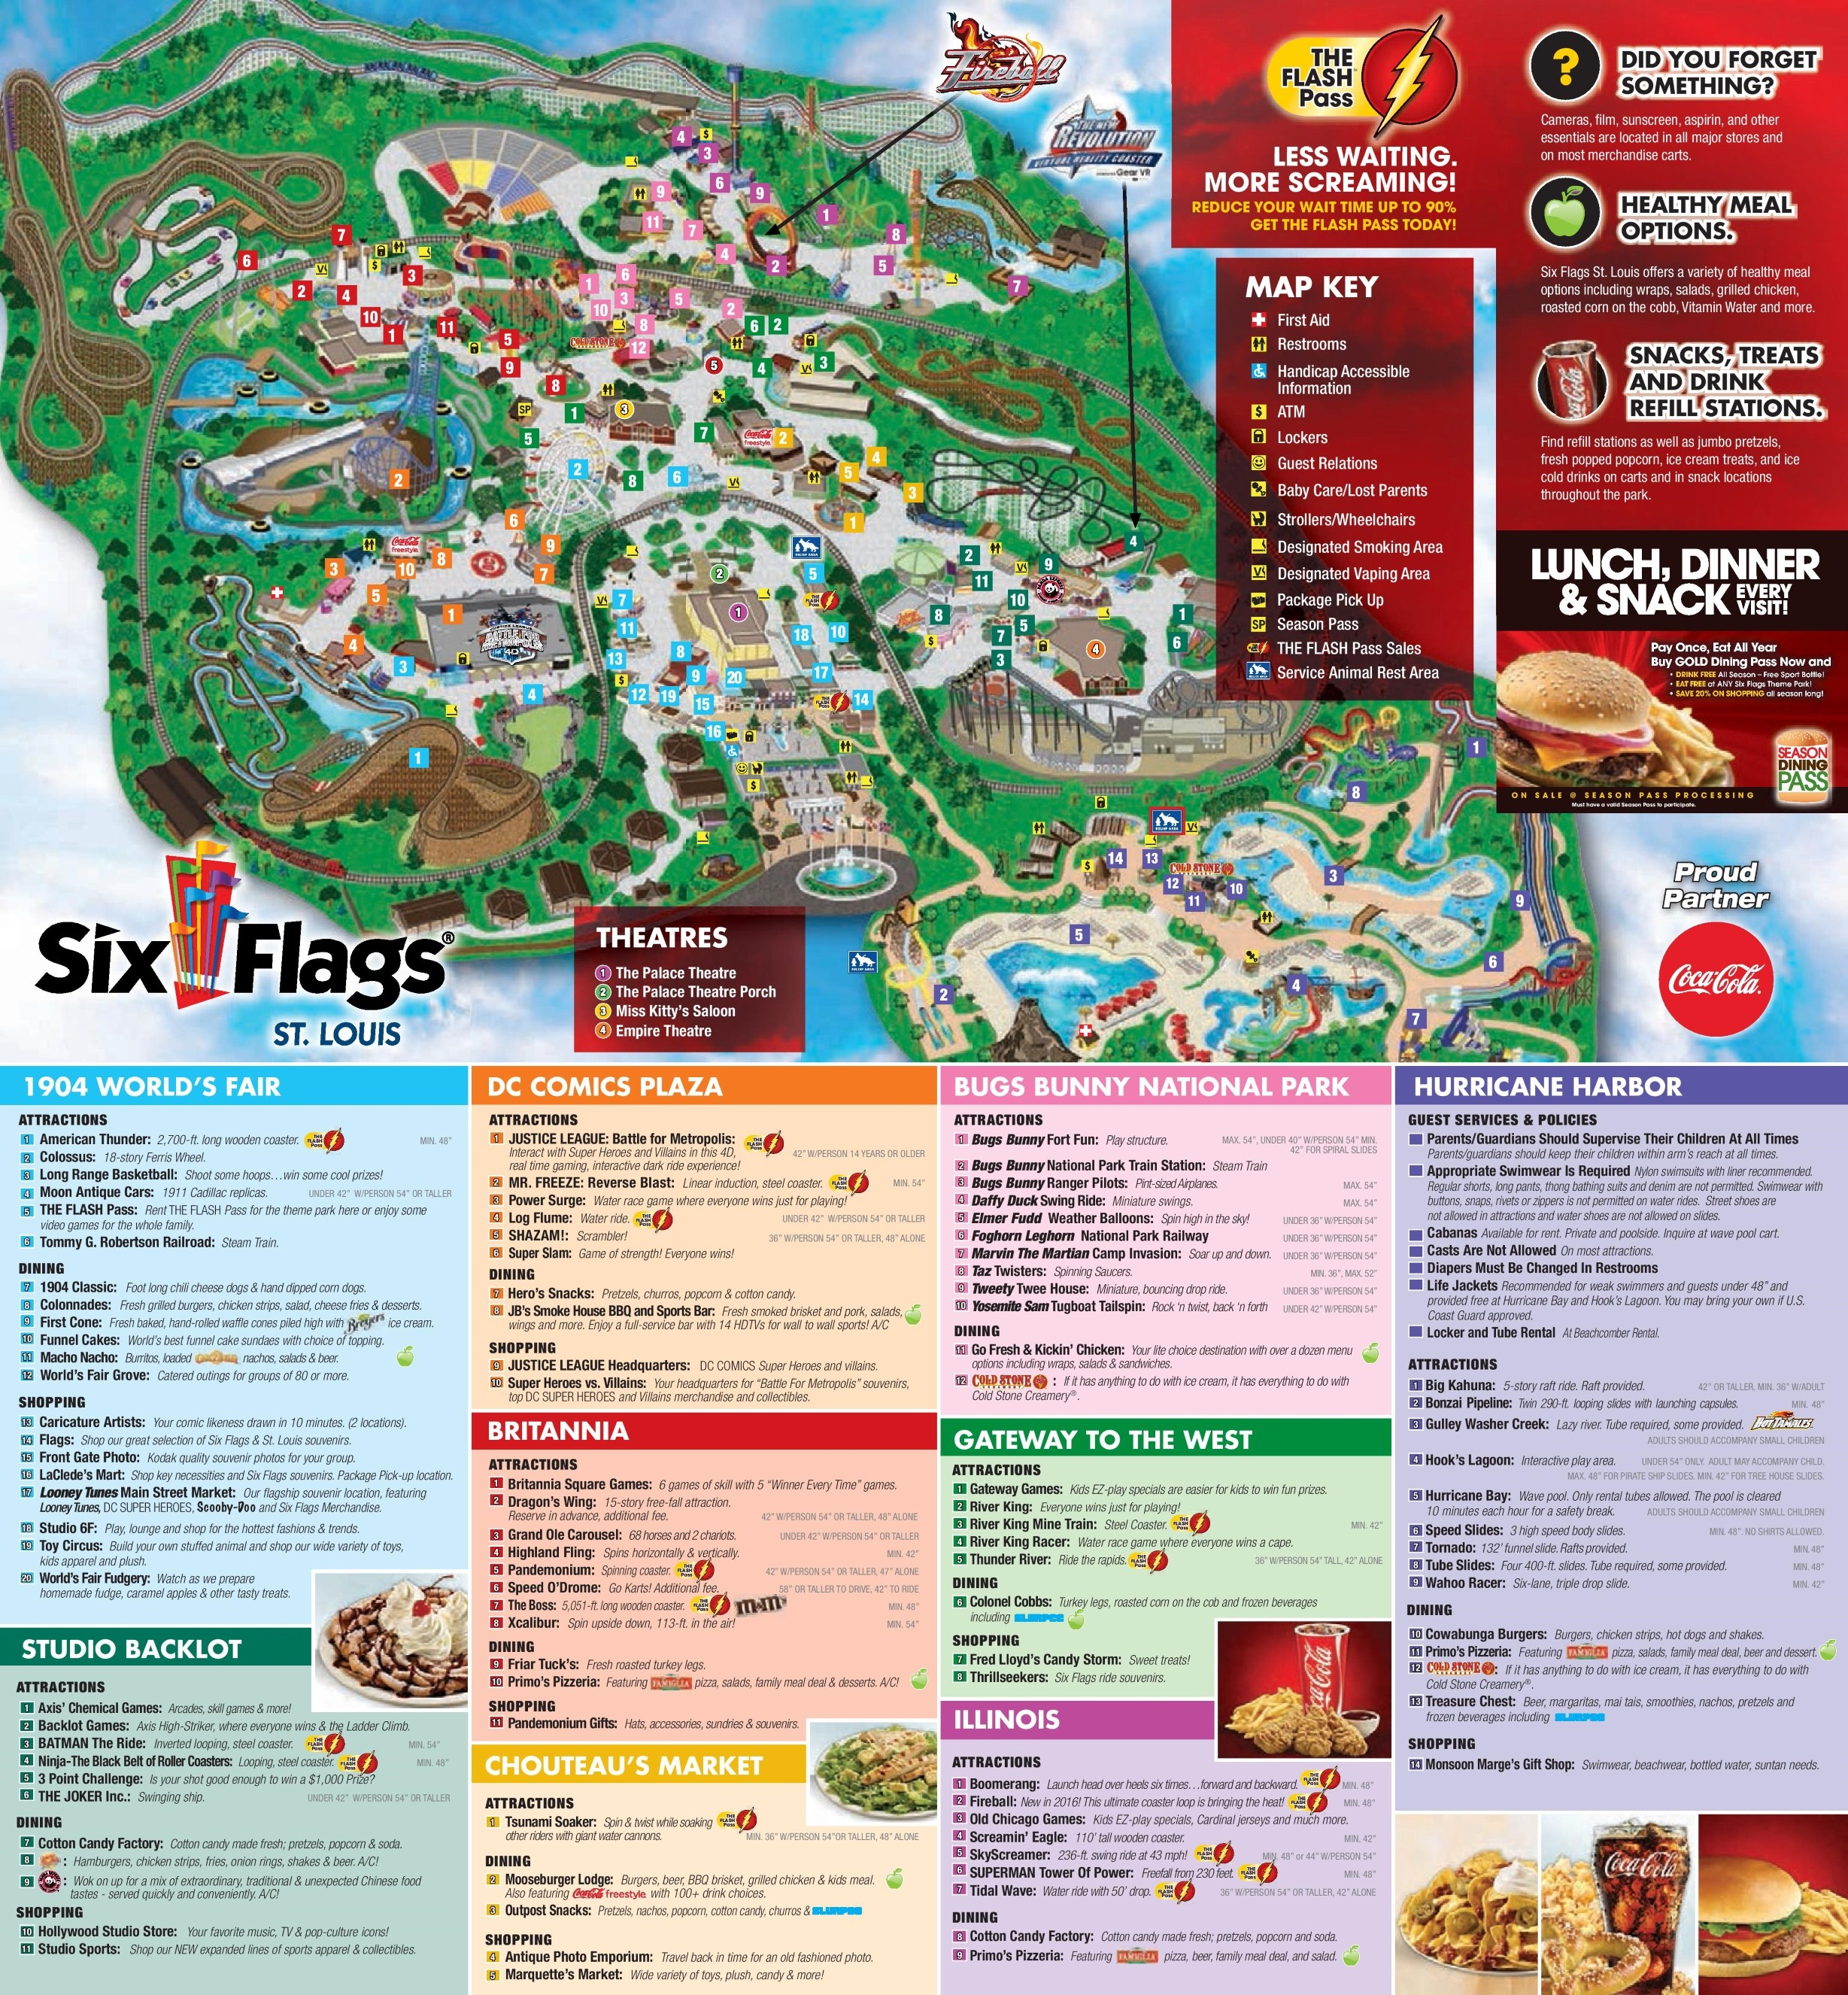 Six Flags Map Usa | Globalsupportinitiative - Six Flags Fiesta Texas Map 2018